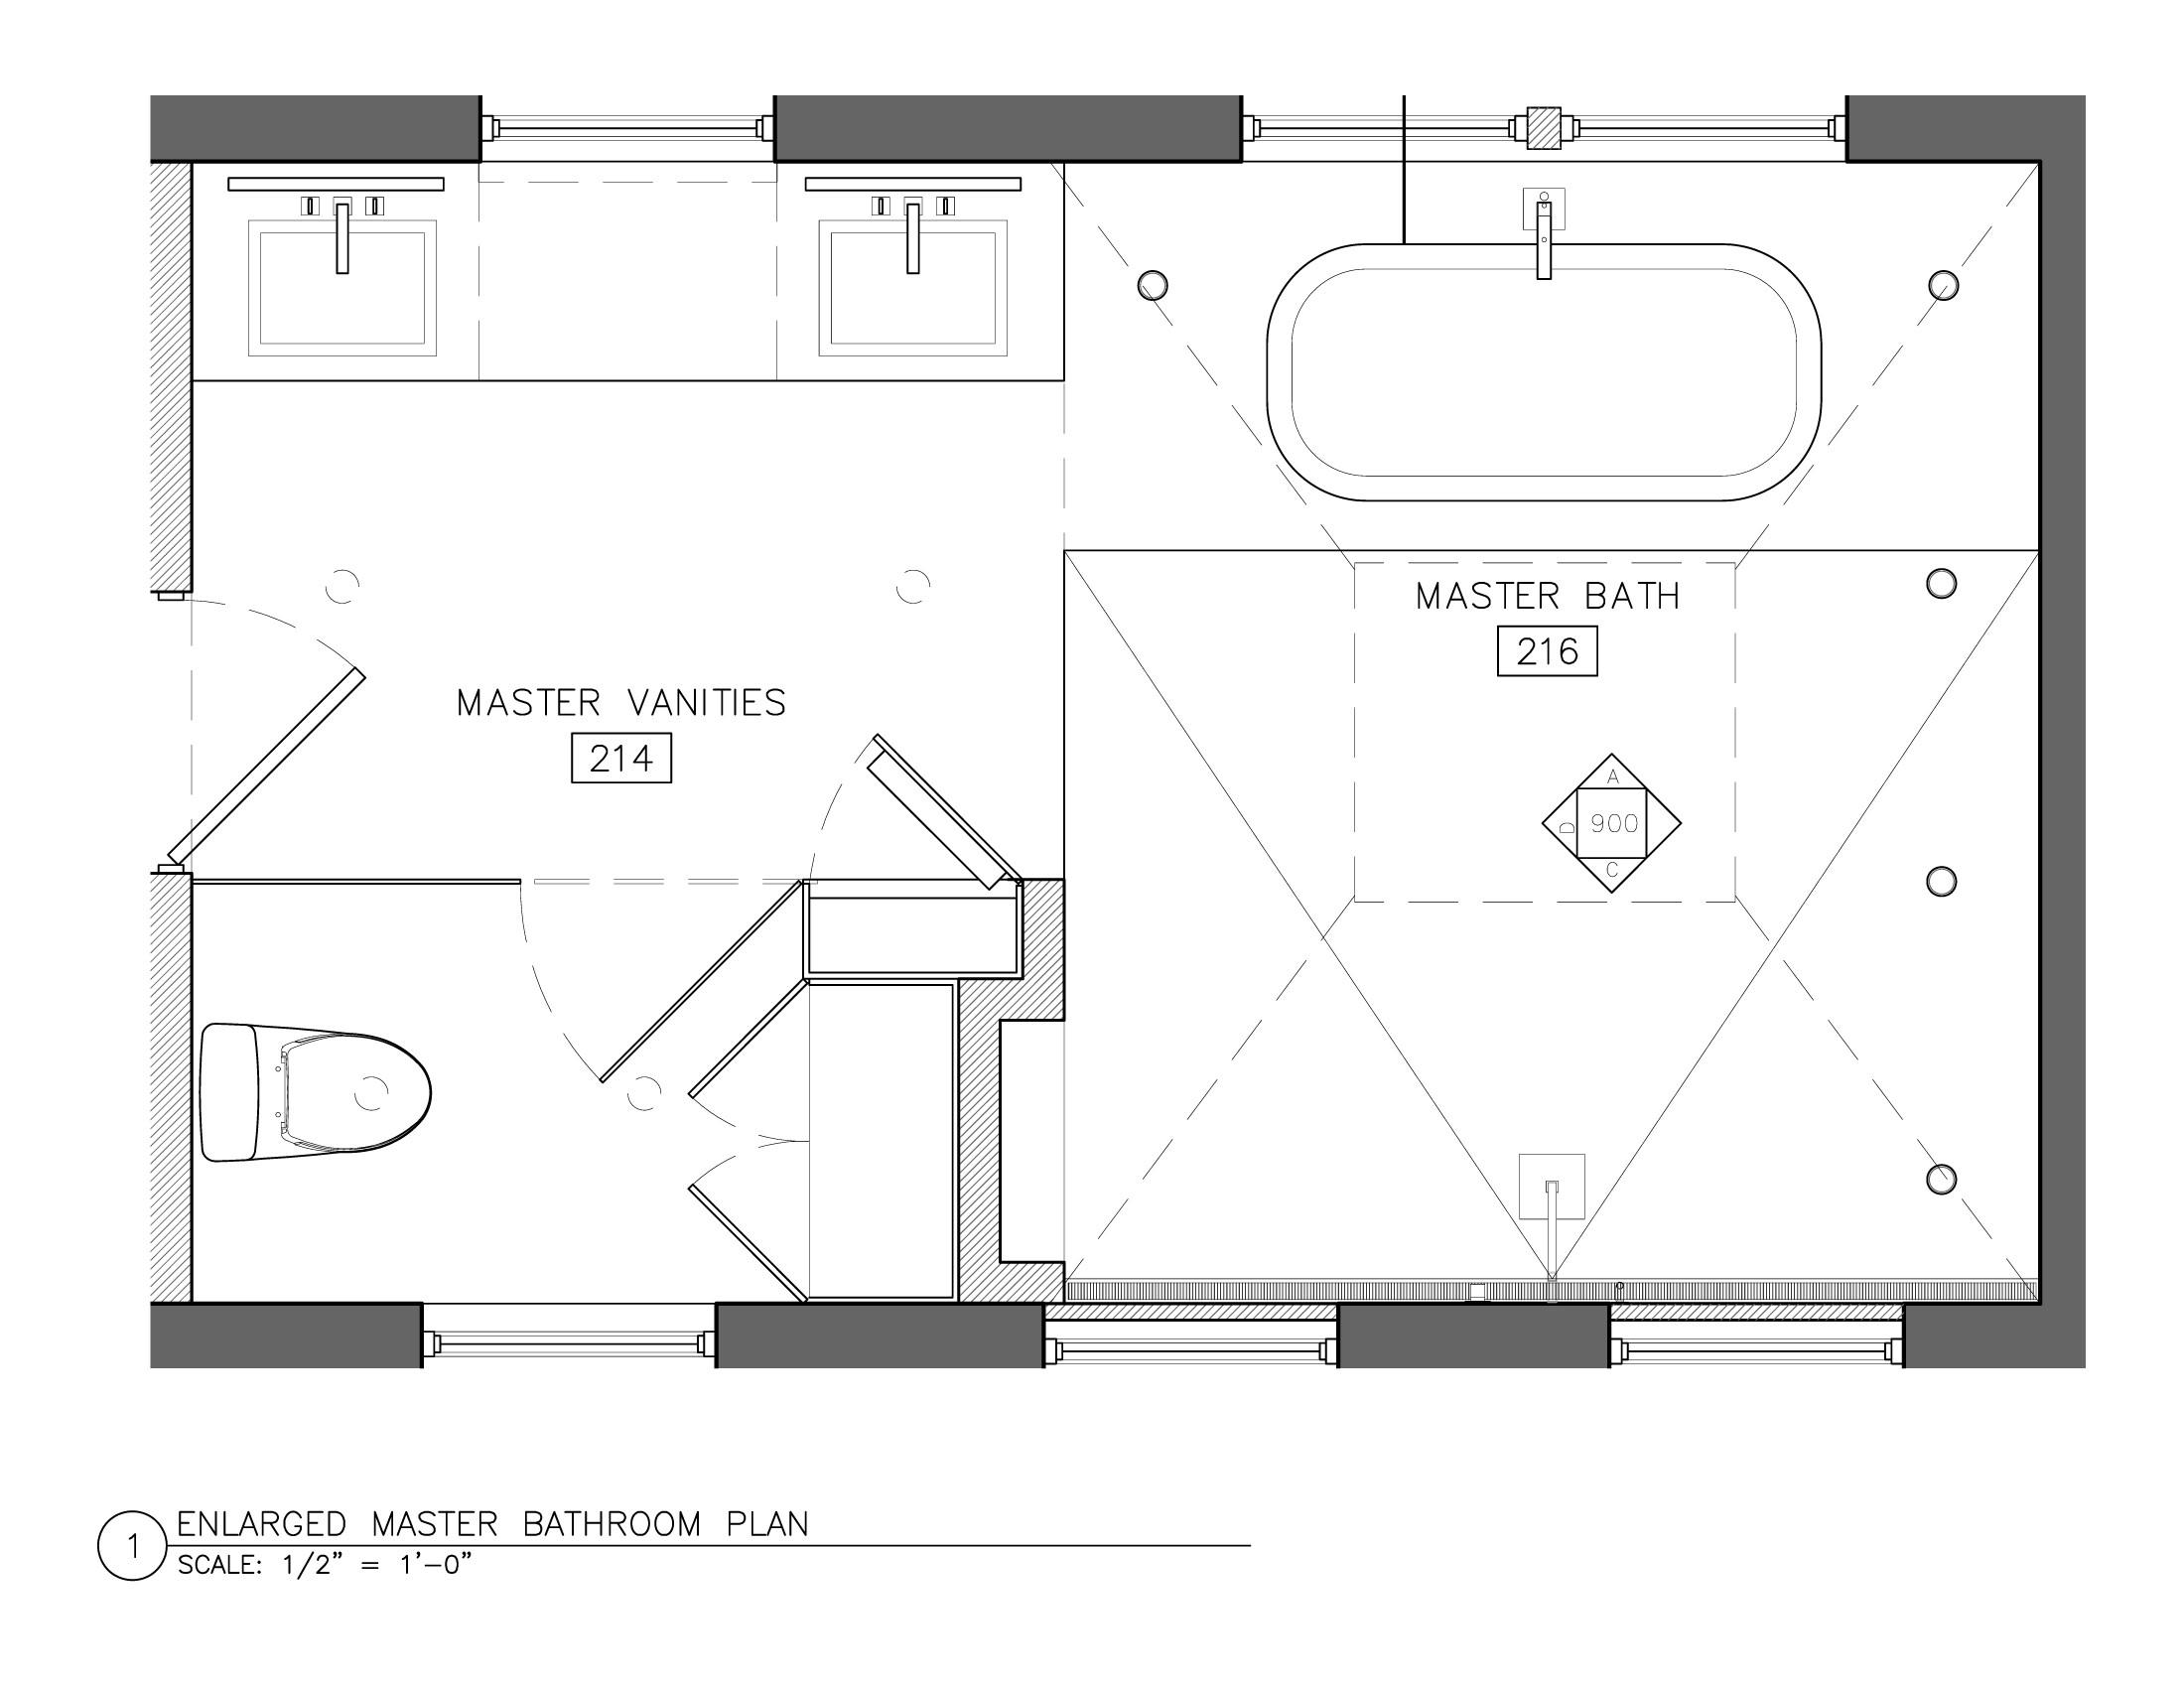 Master Bathroom Plans  Behind The Scenes Bathroom Battles cont Vicente Wolf